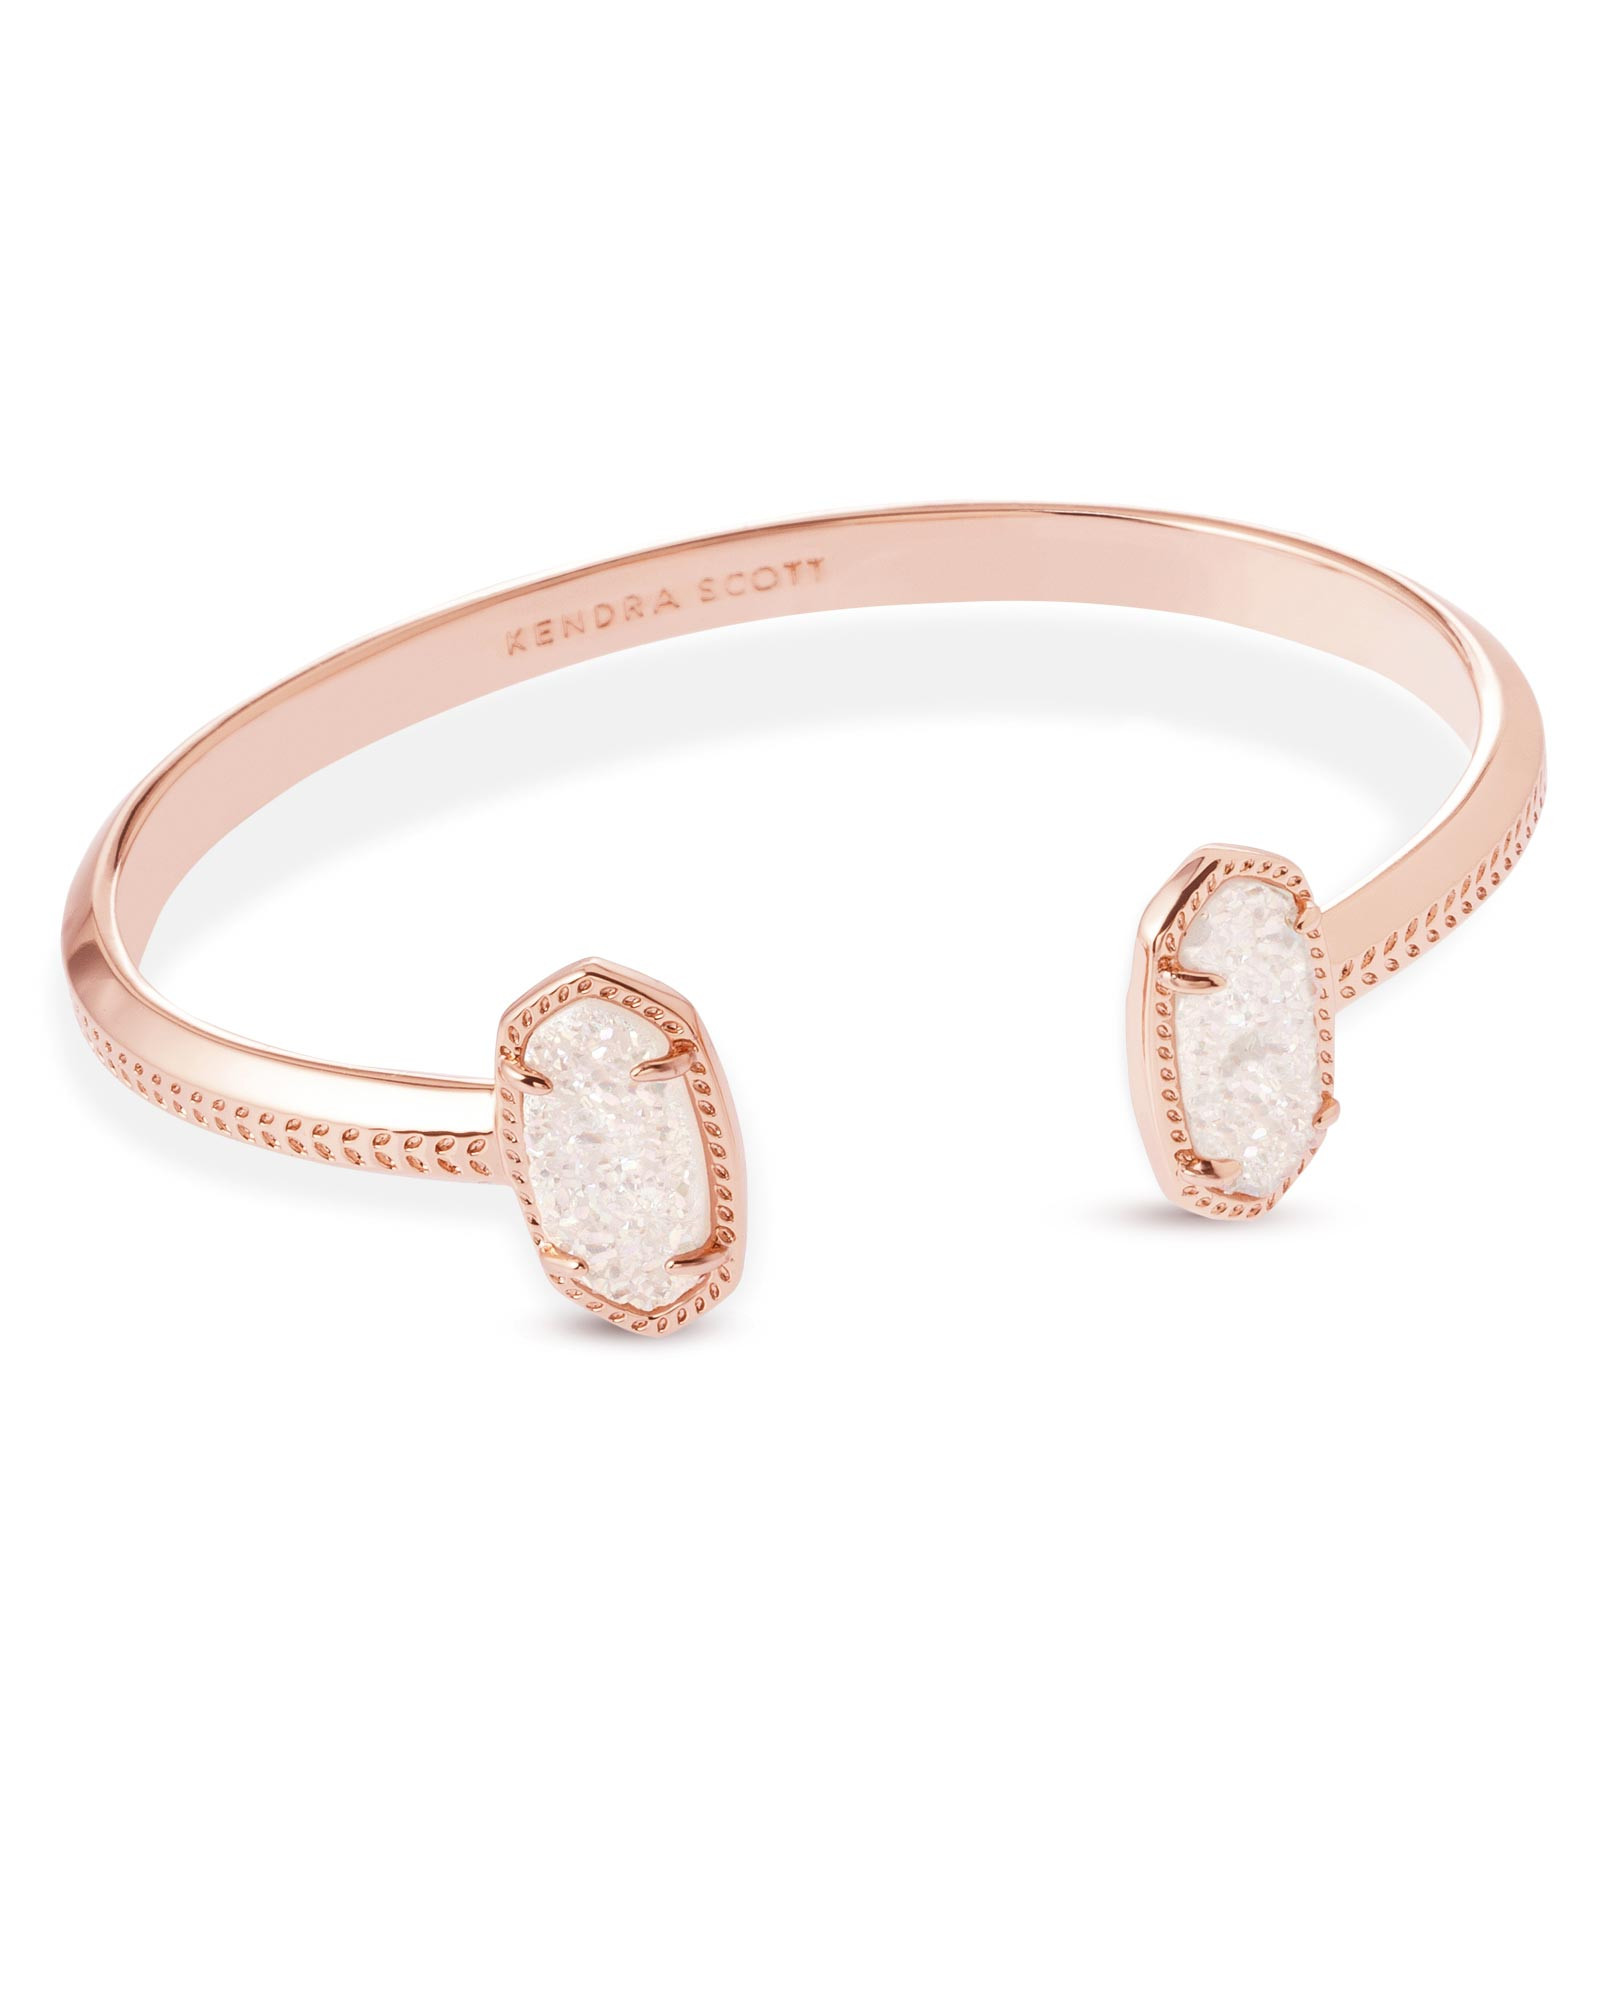 Rose Gold Bracelet  Elton Rose Gold Pinch Cuff Bracelet in Drusy